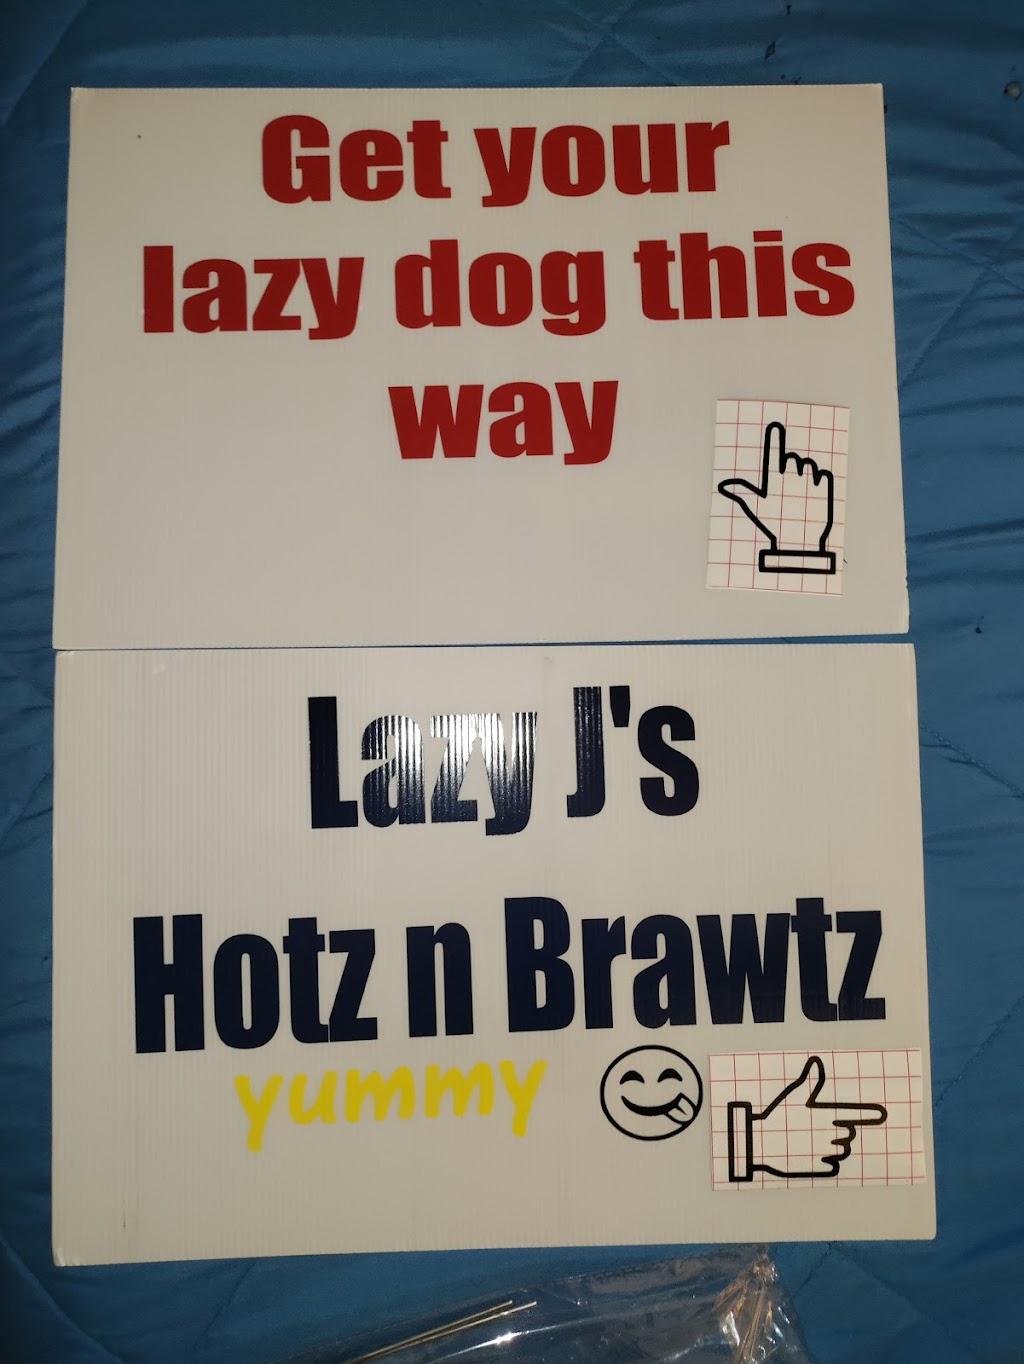 Lazy Js Hotz n Brawtz   restaurant   NC-172, Sneads Ferry, NC 28460, USA   9105267771 OR +1 910-526-7771